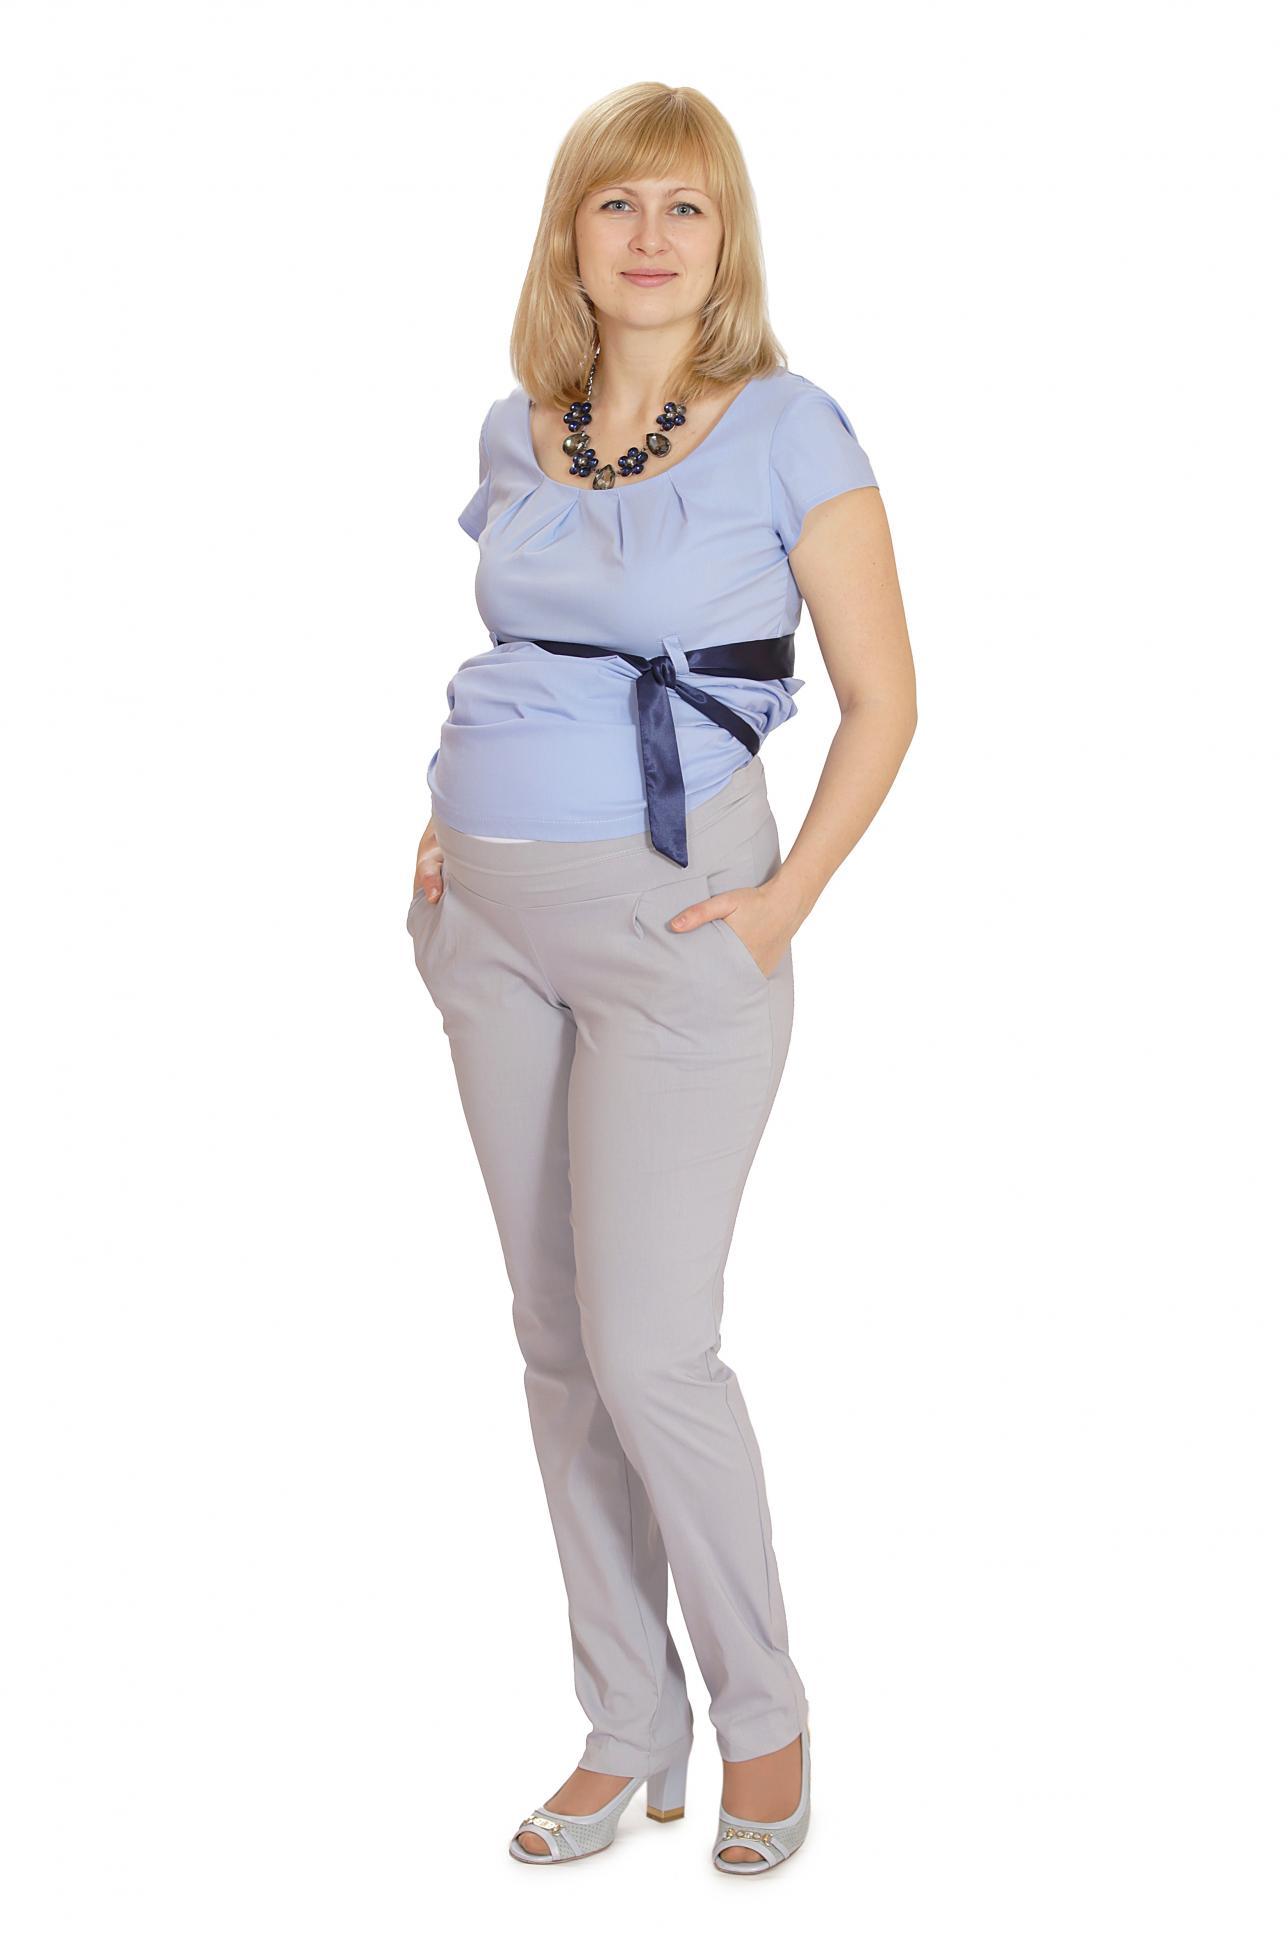 Мода брюки с доставкой